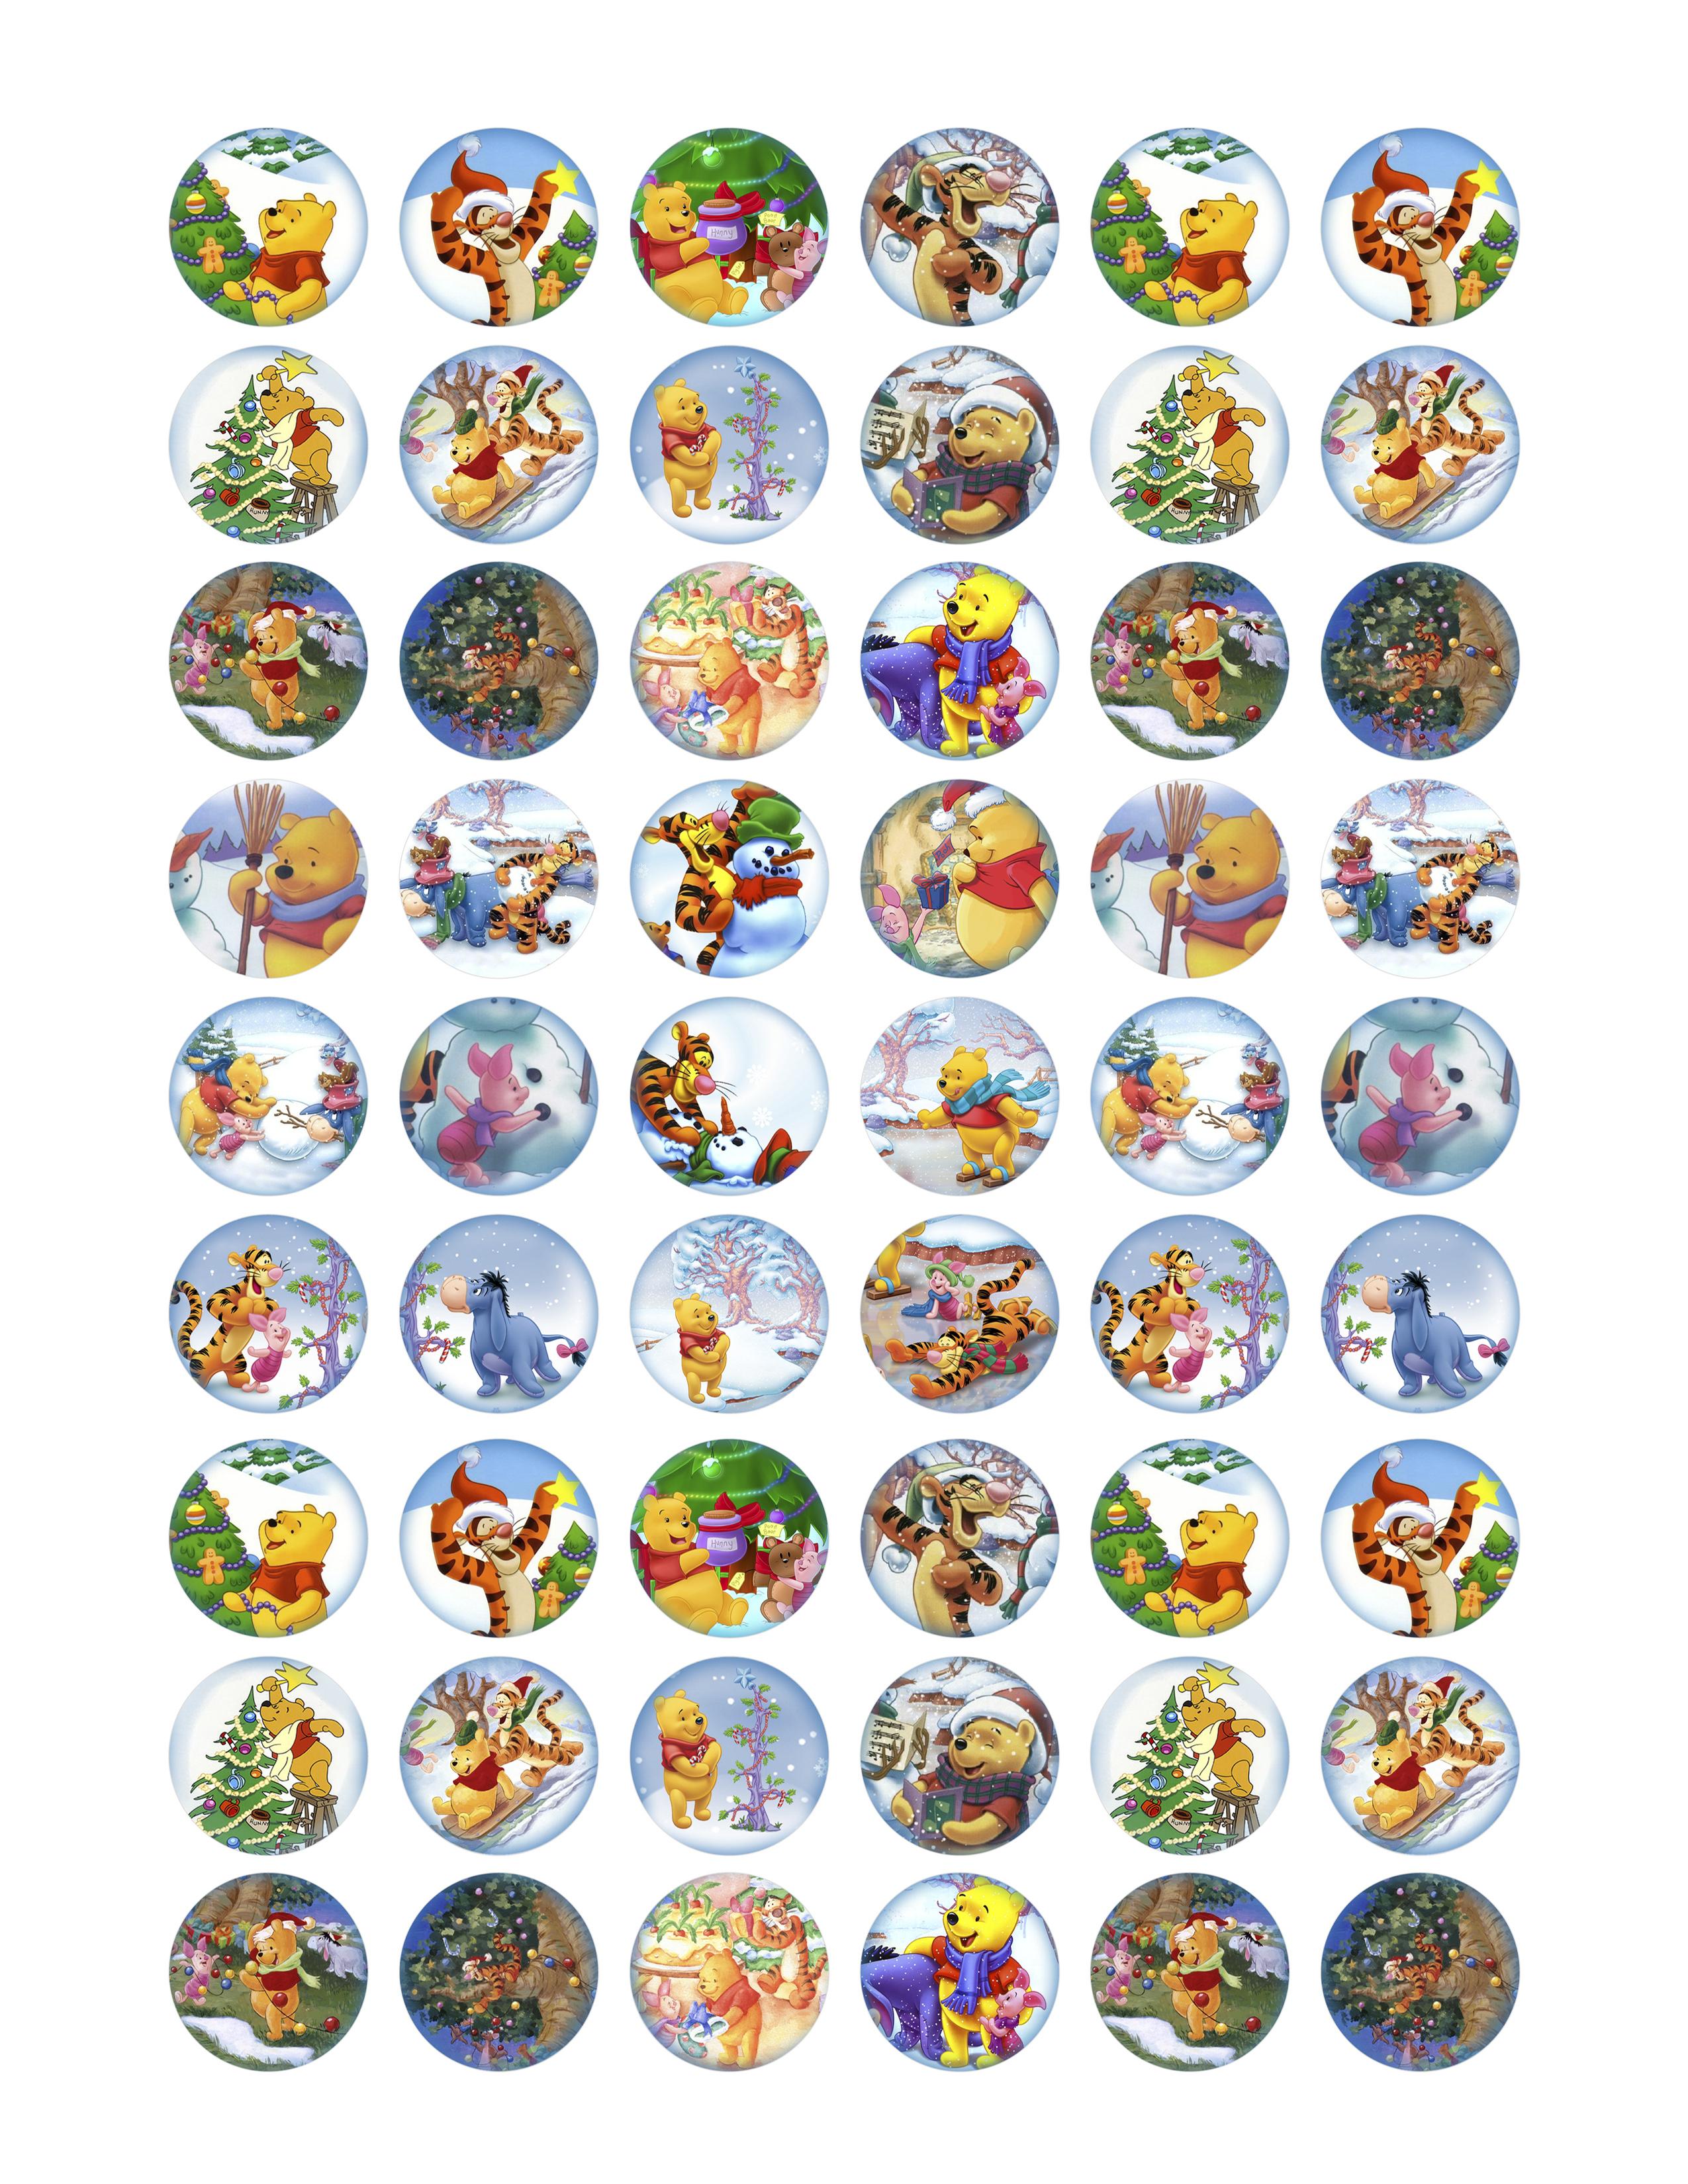 Free Collage Sheets | Bottlecap4U - Free Printable Digital Collage Sheets